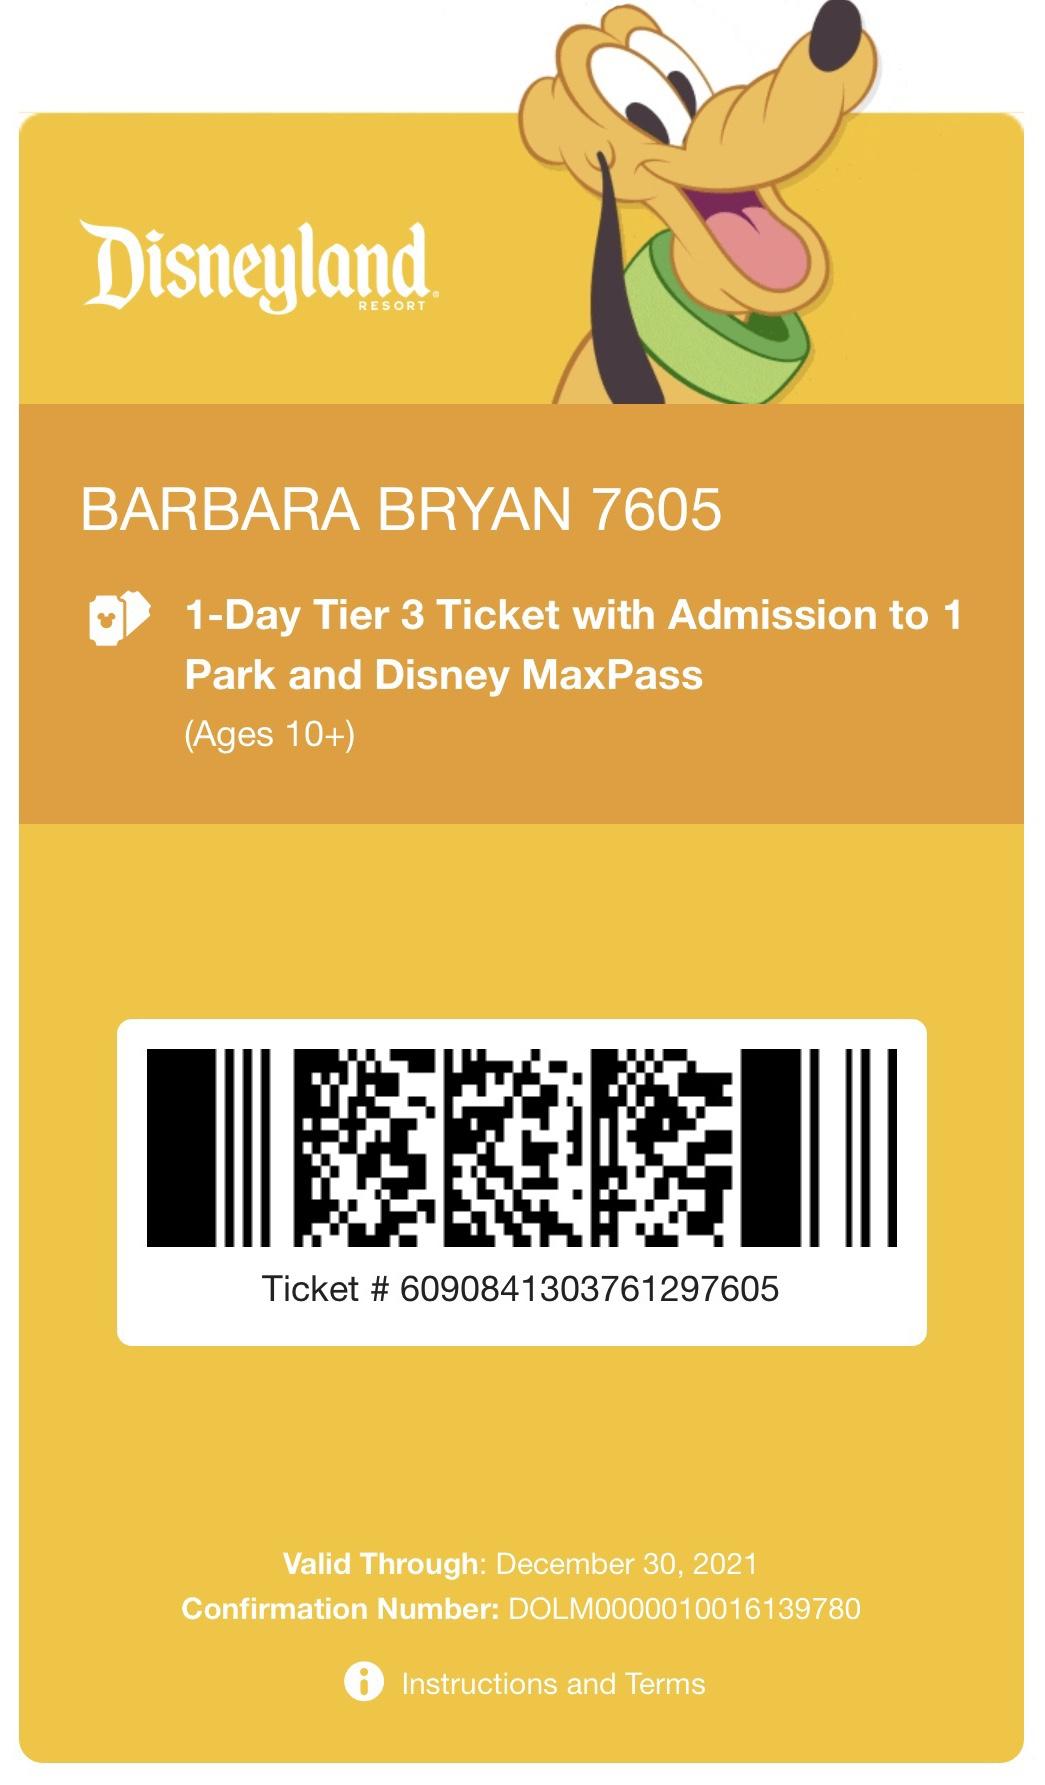 Disneyland App online Disneyland ticket